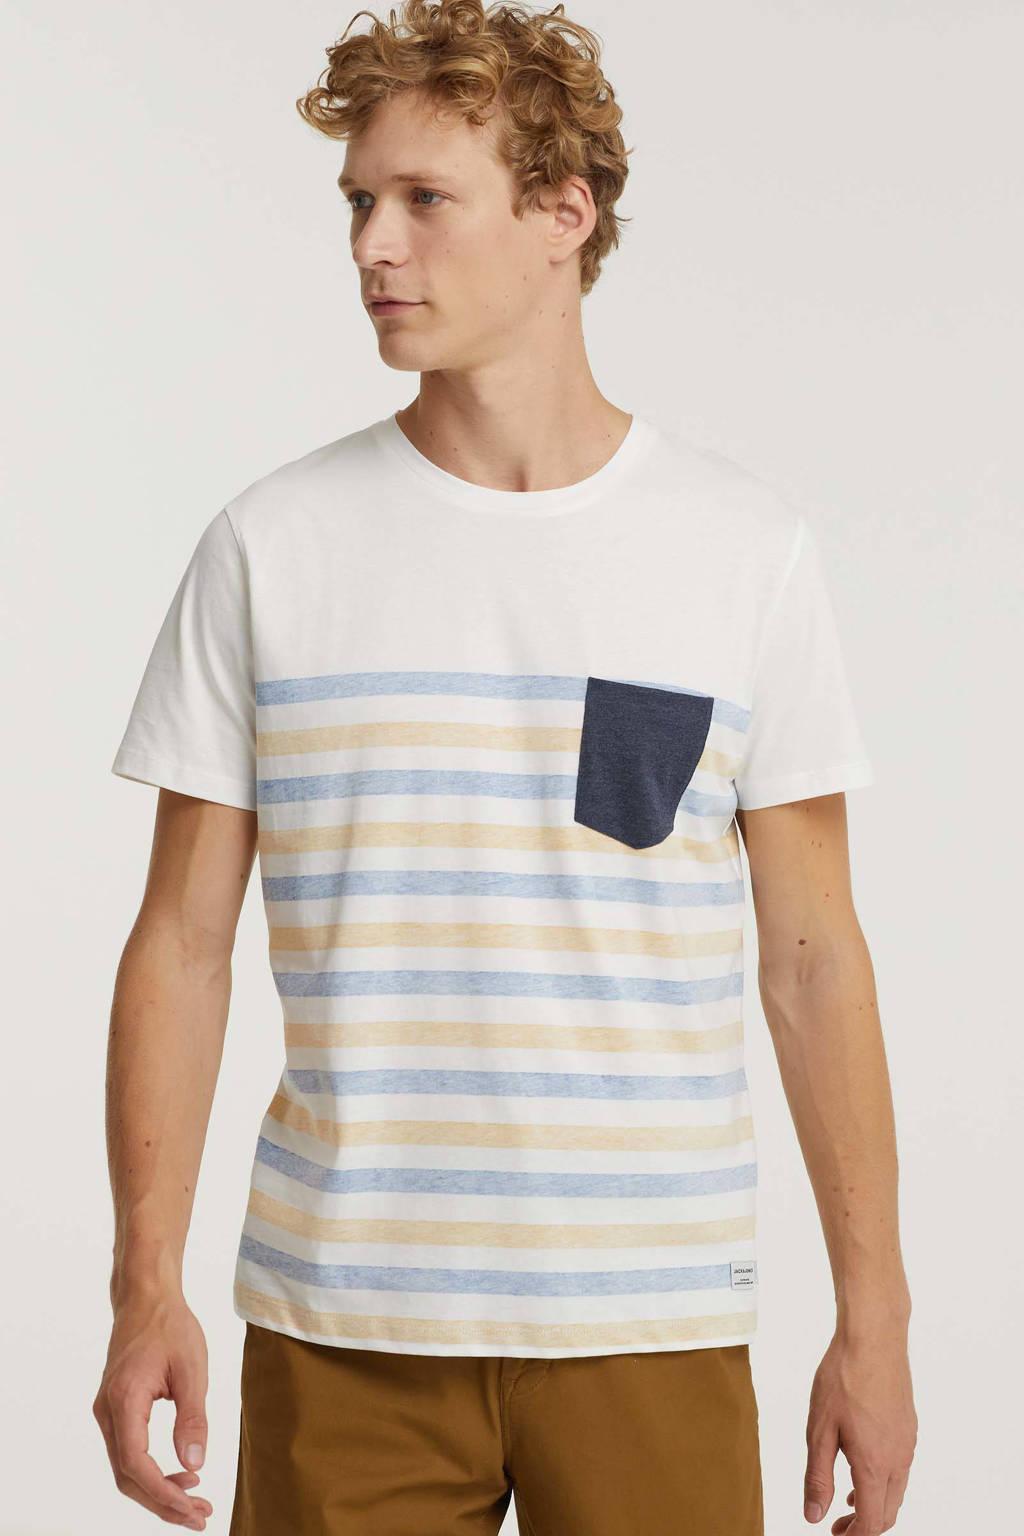 JACK & JONES ORIGINALS gestreept regular fit T-shirt JWHGMS blauw, Blauw